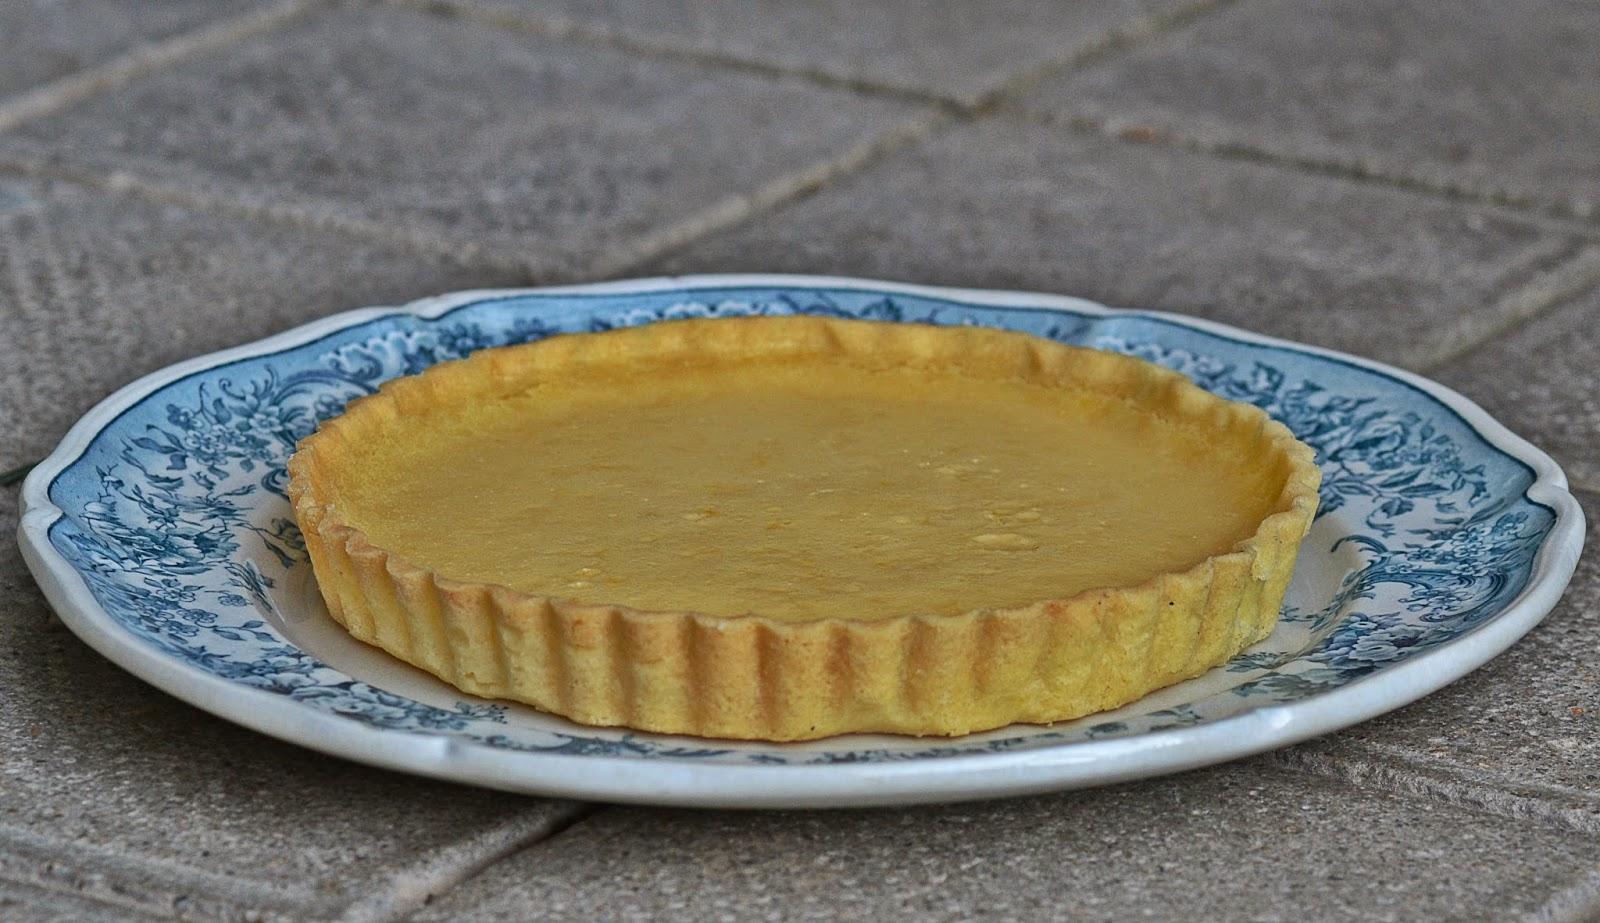 Heel Holland bakt Citroentaart